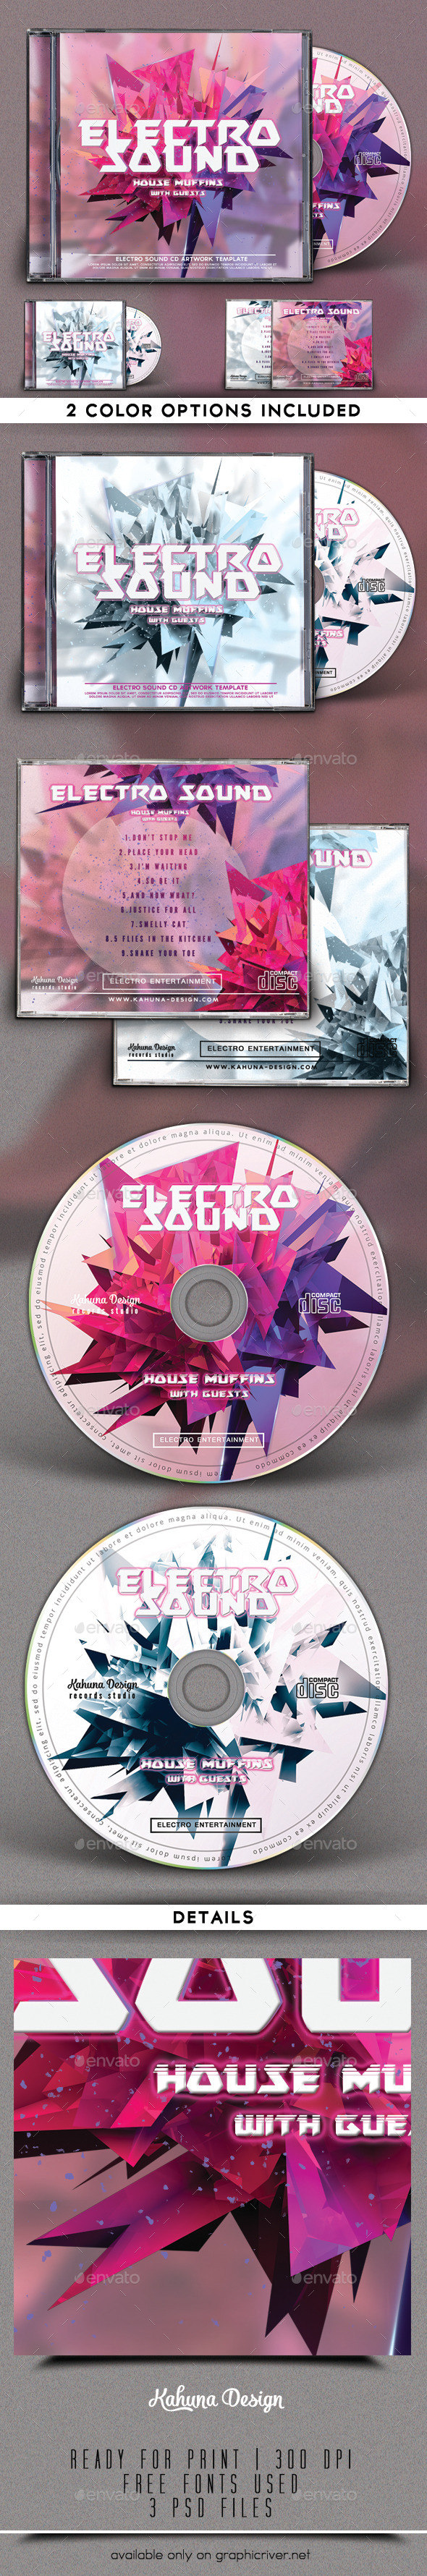 Electro Sound CD Artwork - CD & DVD Artwork Print Templates